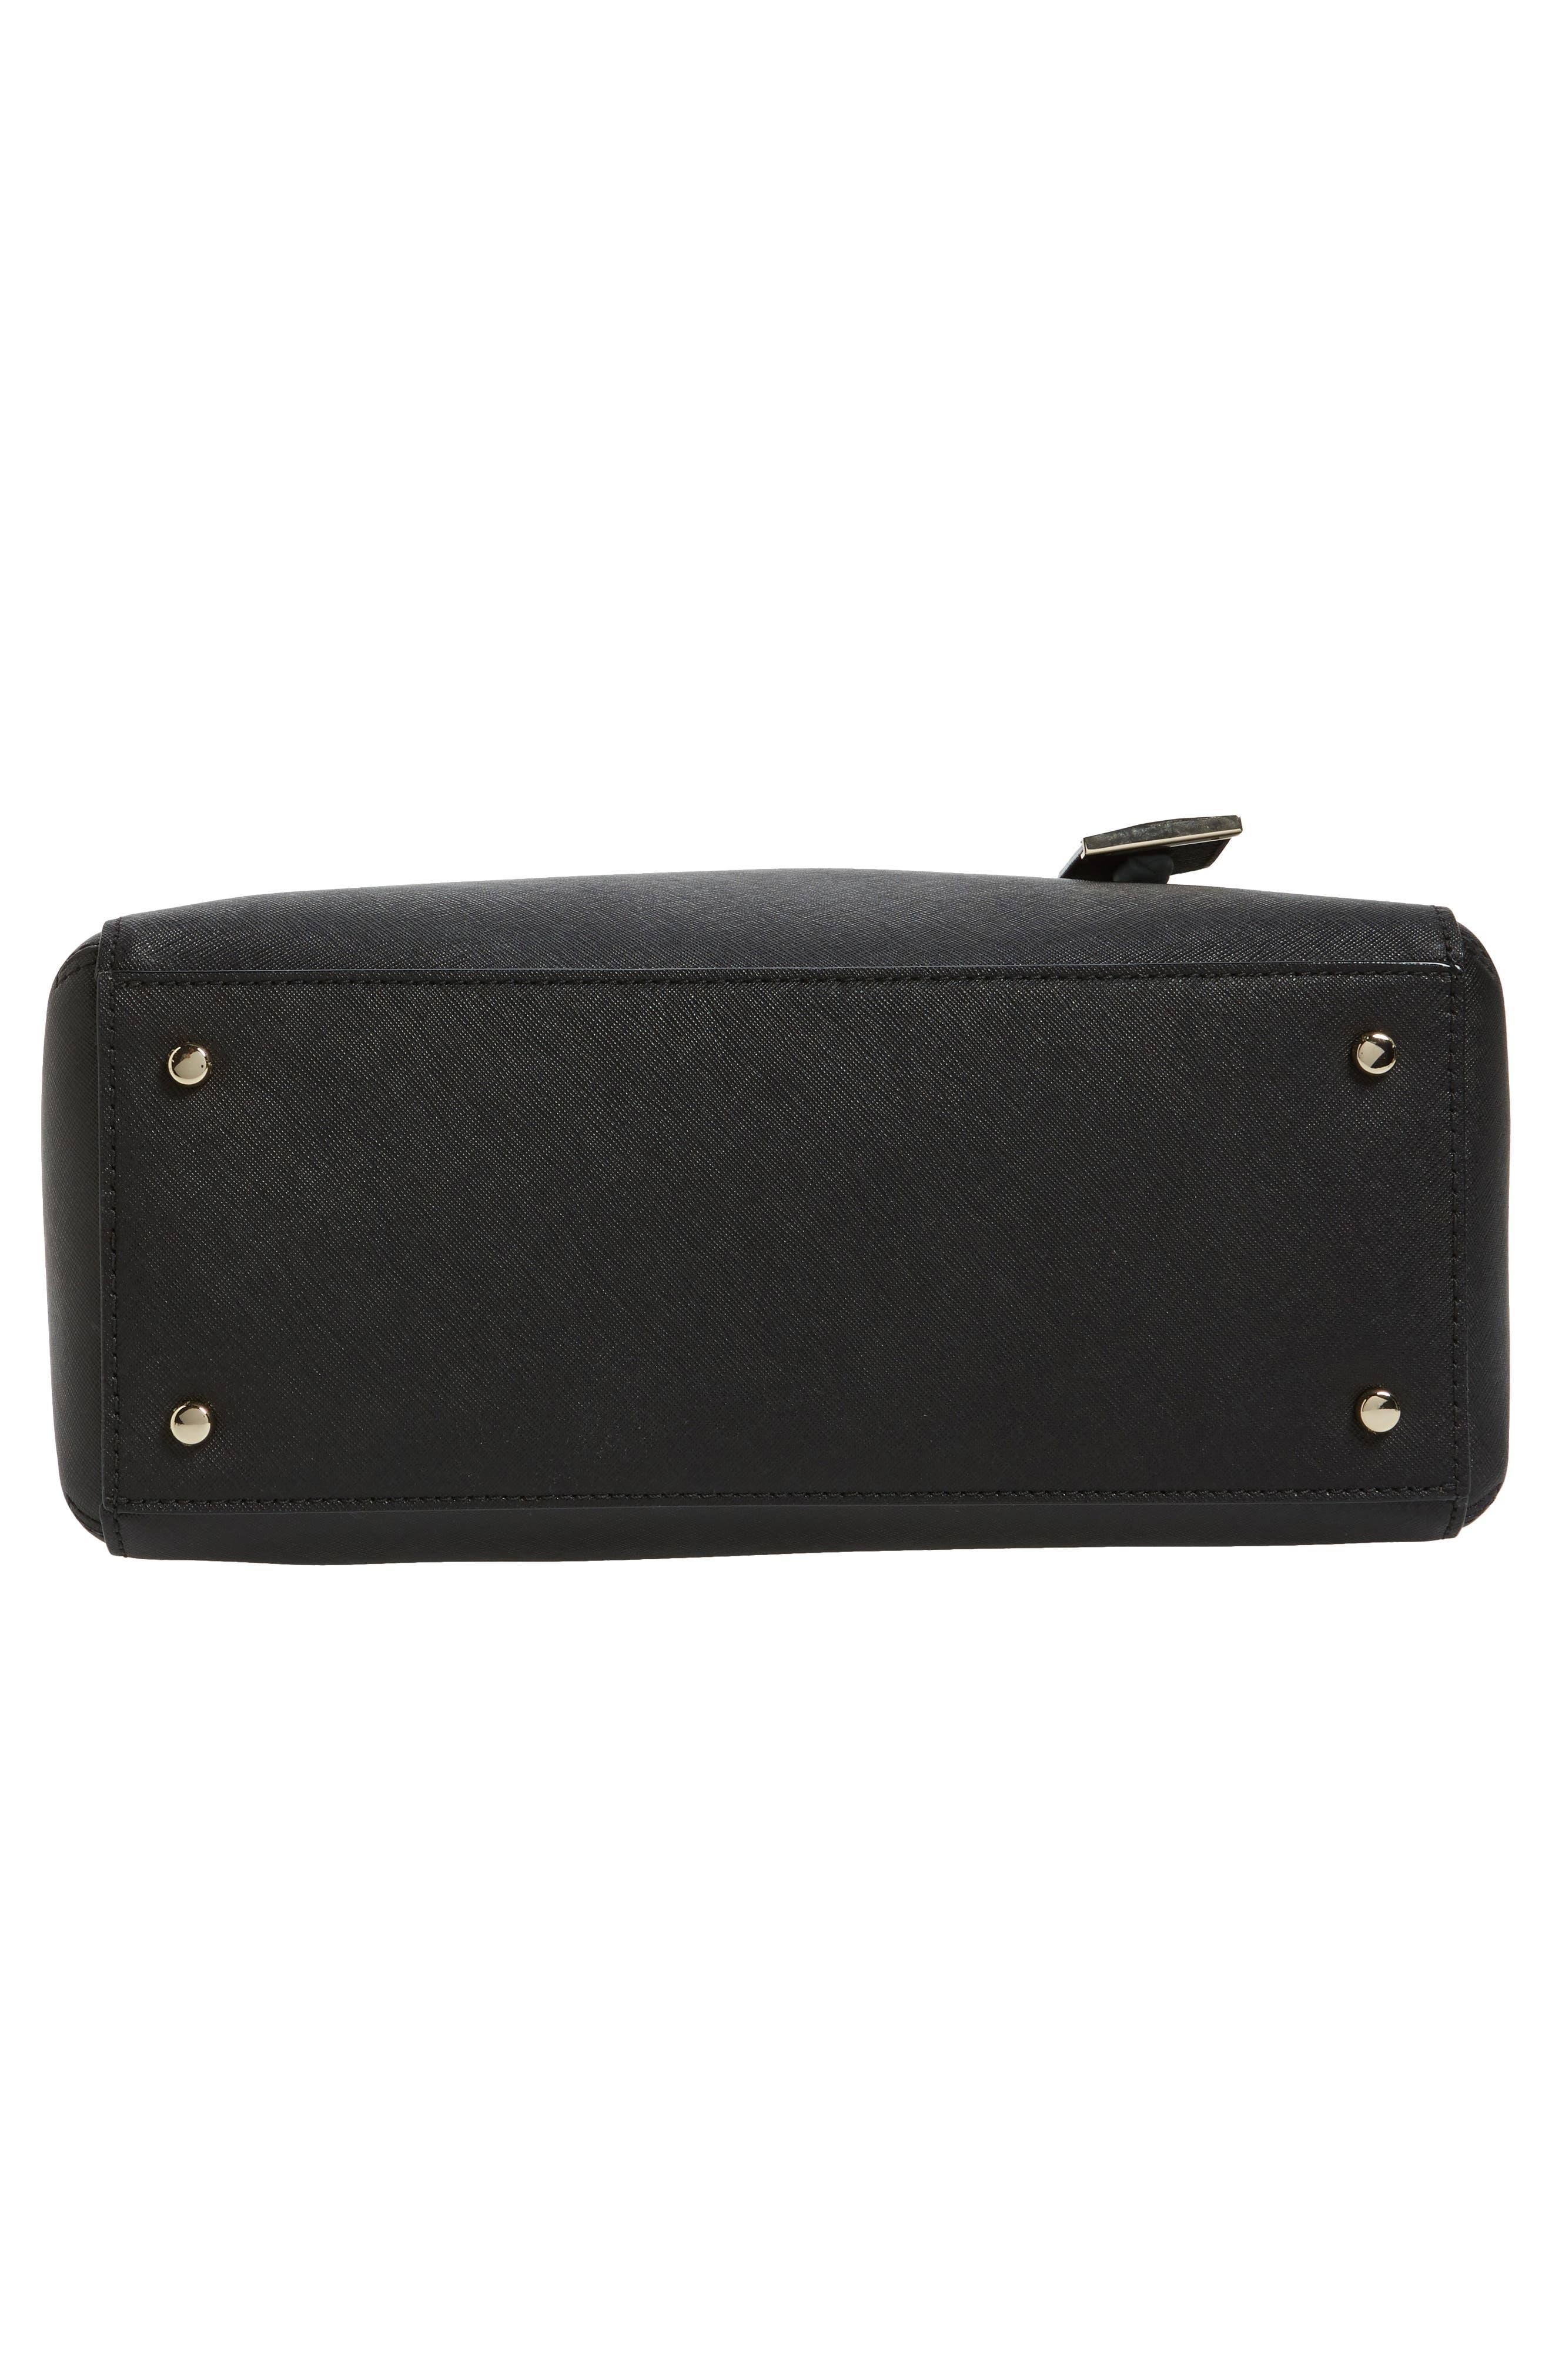 mega cameron street - lane leather satchel,                             Alternate thumbnail 6, color,                             001